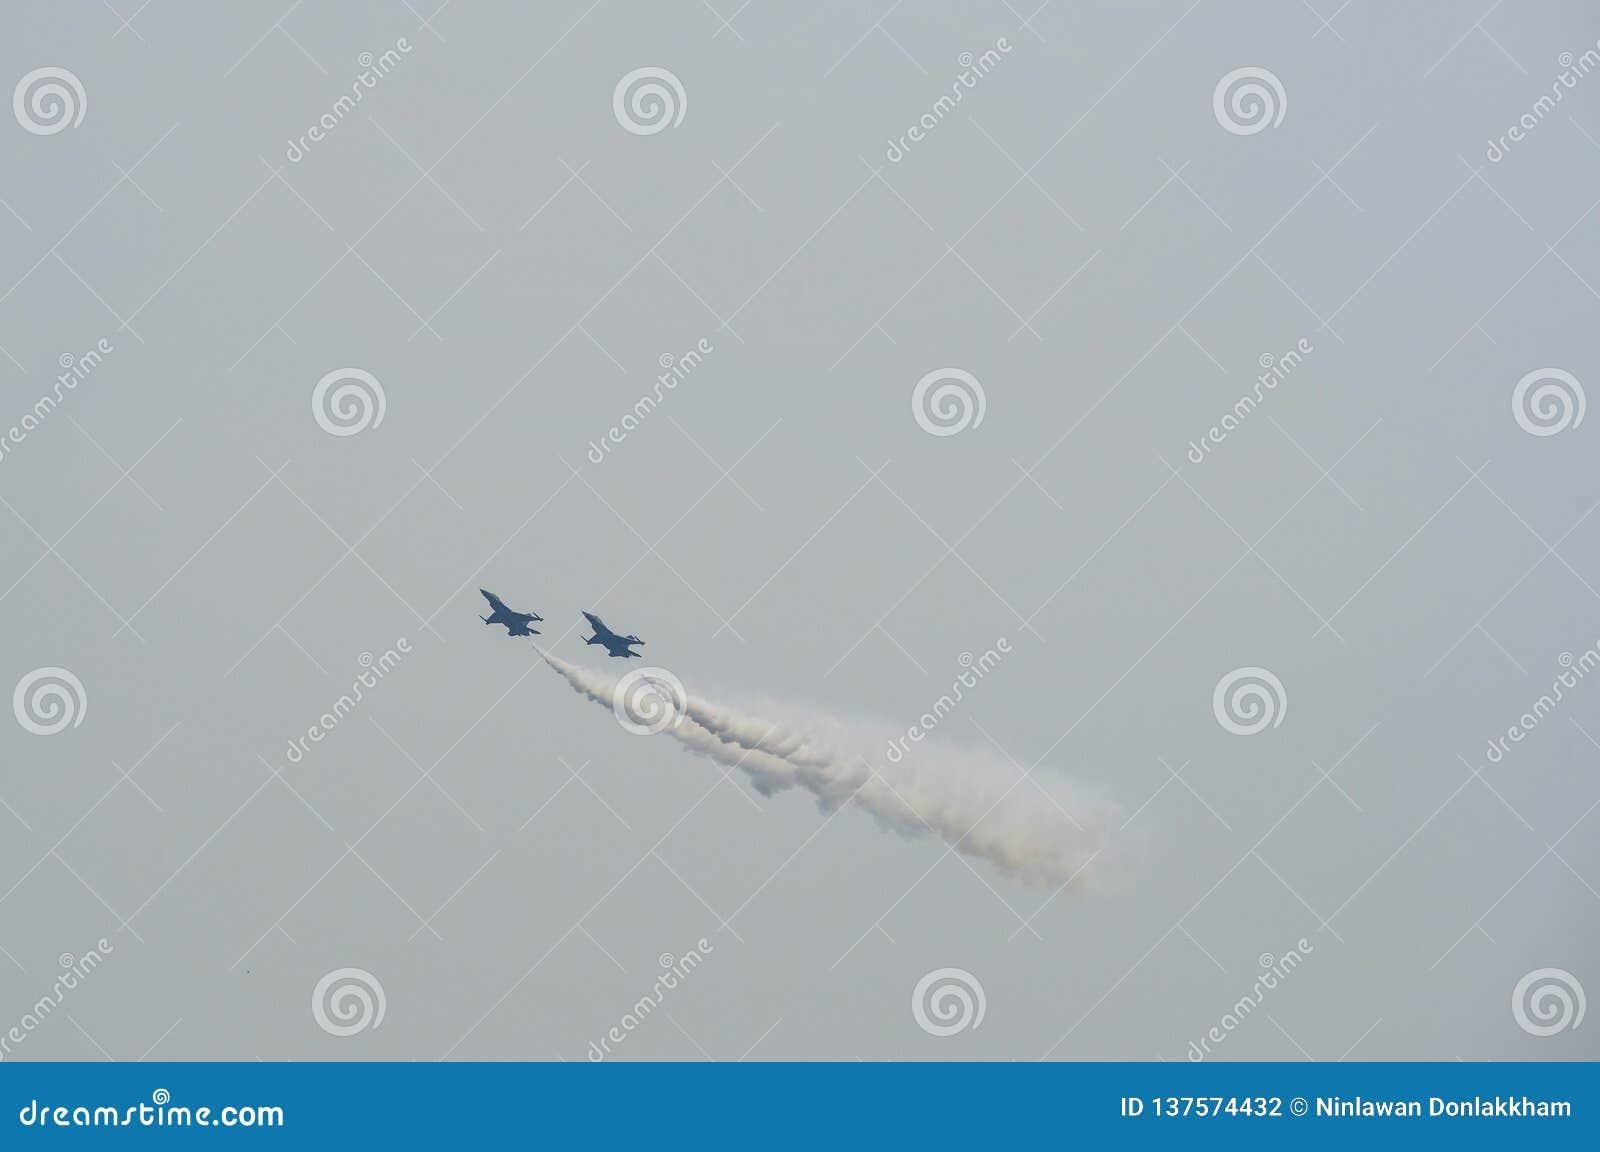 Vechtersvliegtuigen die in Singapore presteren